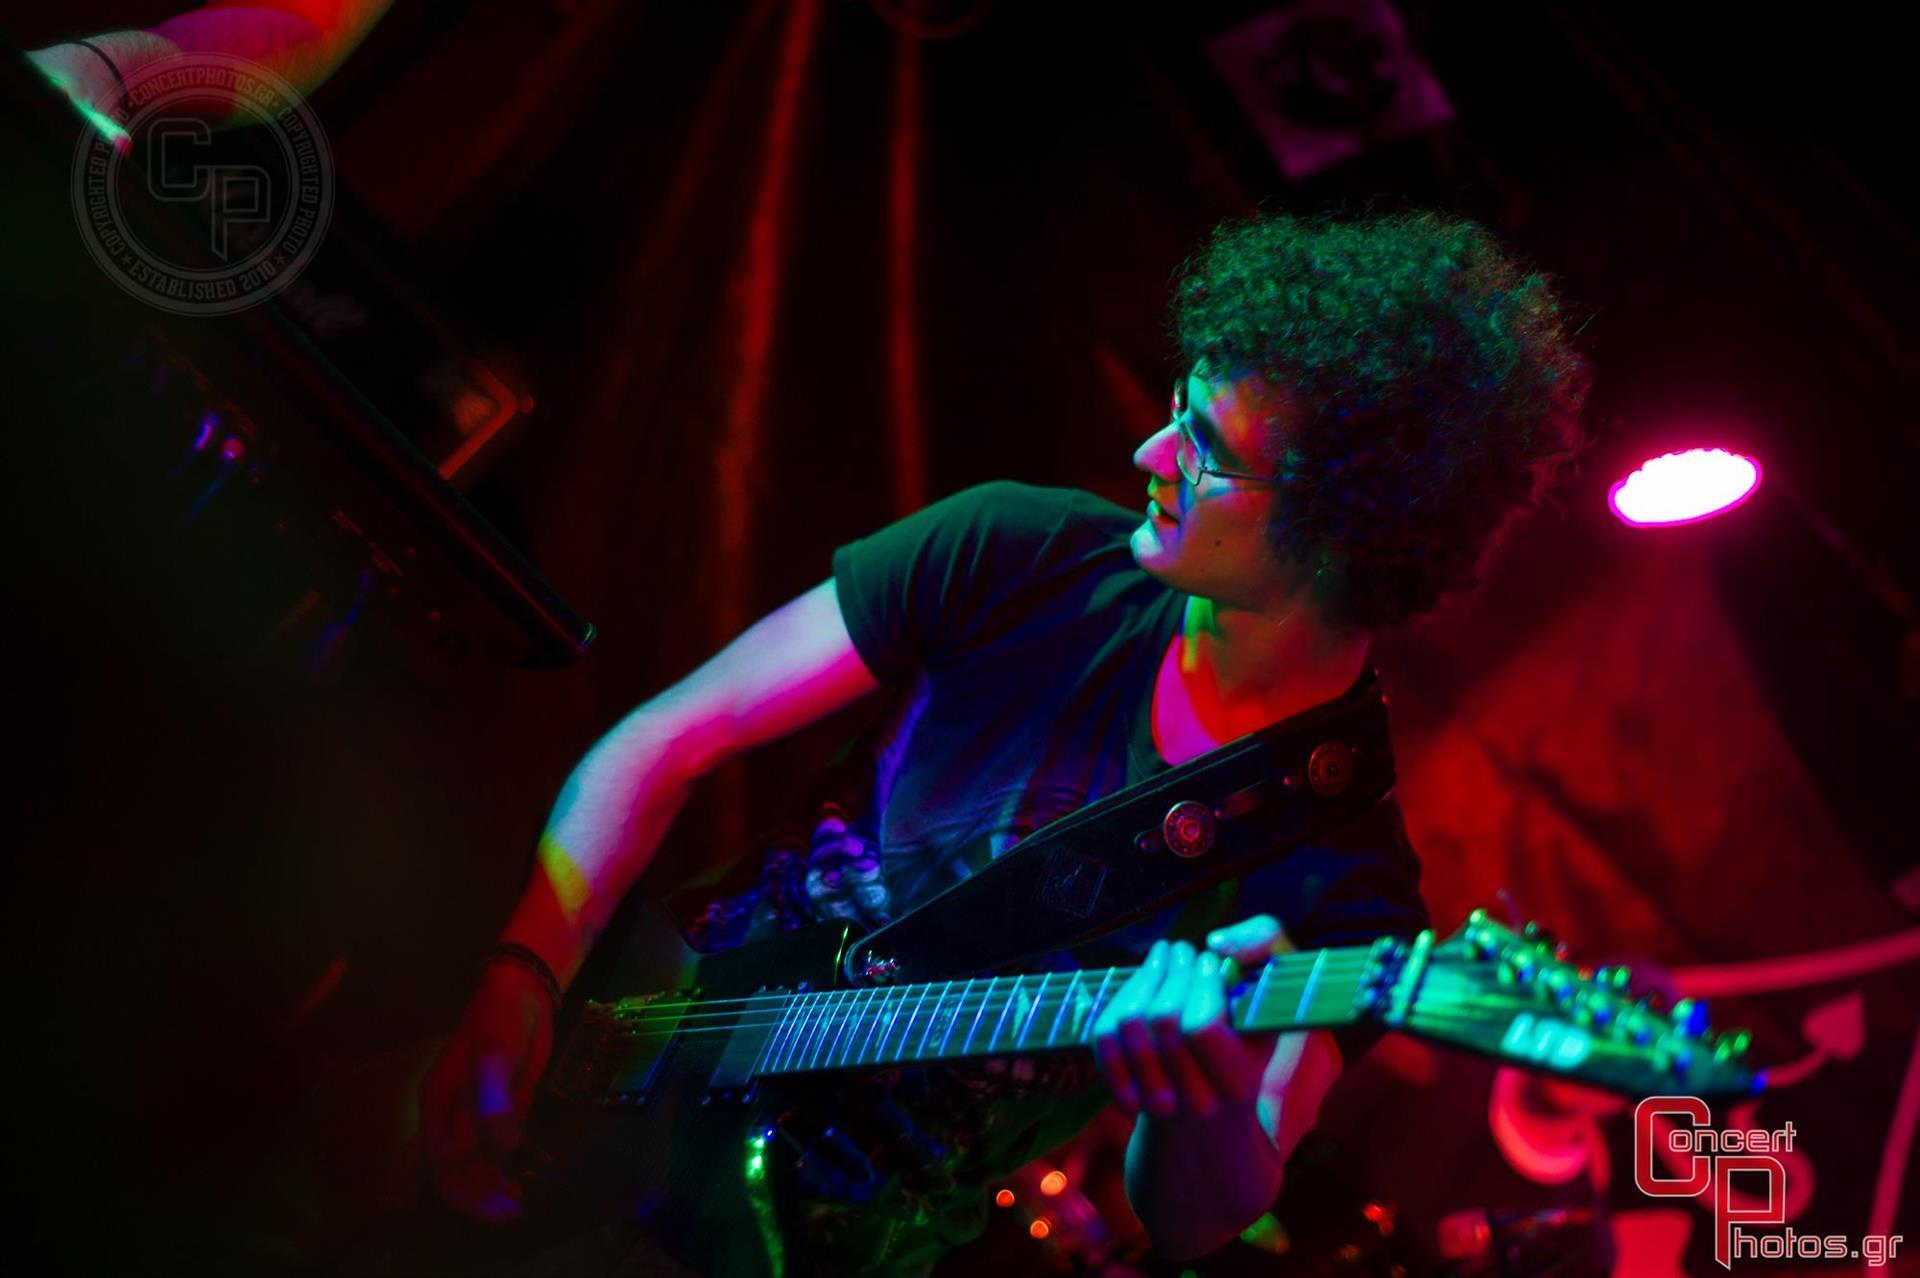 Battle Of The Bands Athens - Leg 3- photographer:  - ConcertPhotos - 20150104_2146_46